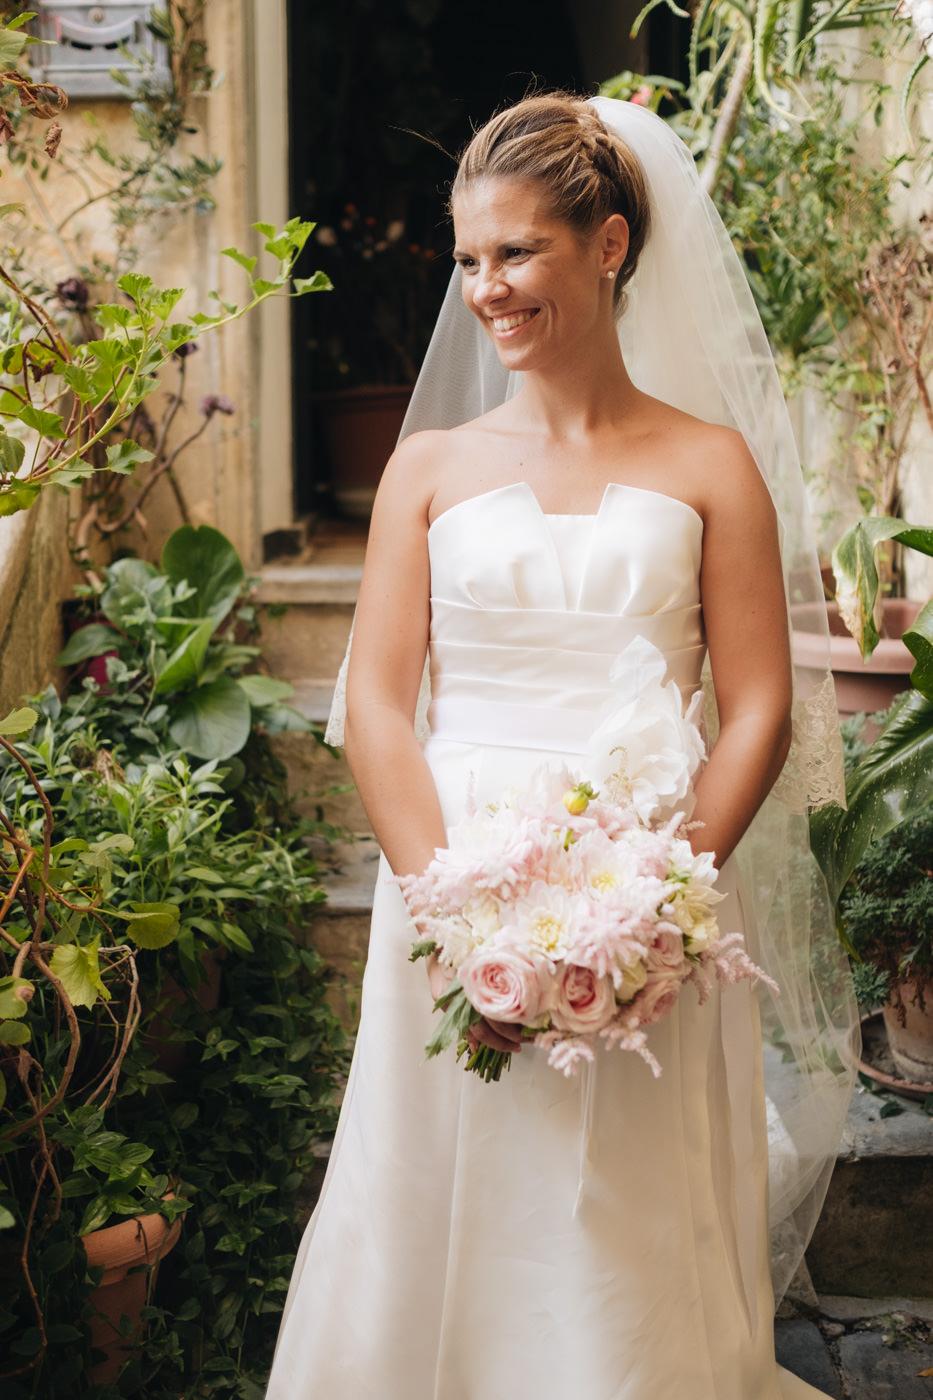 matrimoni_all_italiana_fotografo_matrimonio_cinque_terre-46.jpg